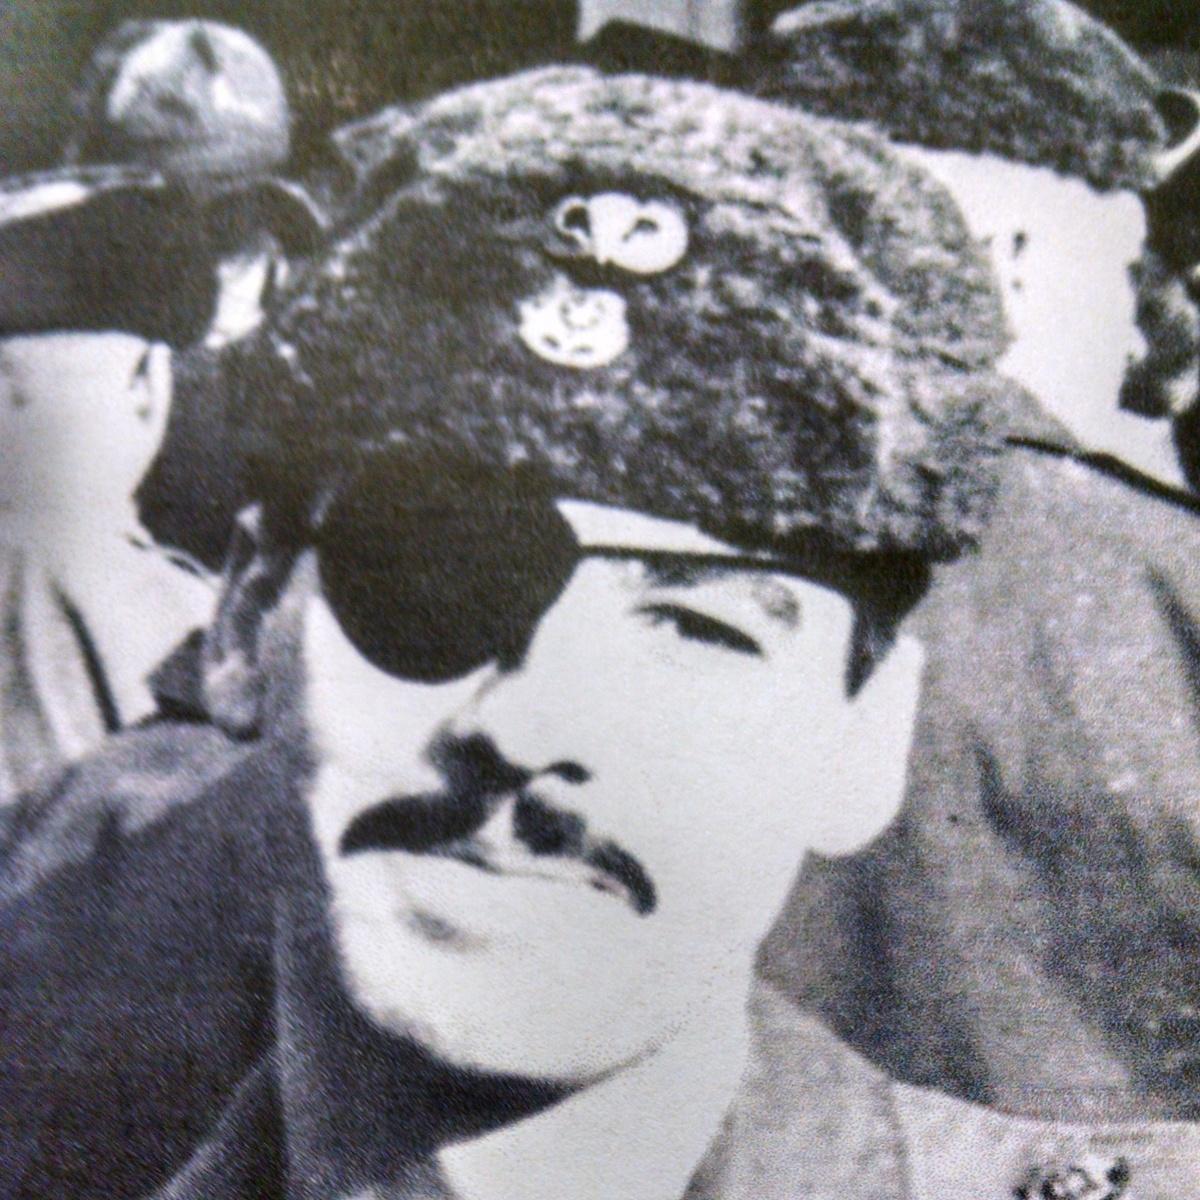 Wolfgang Follman